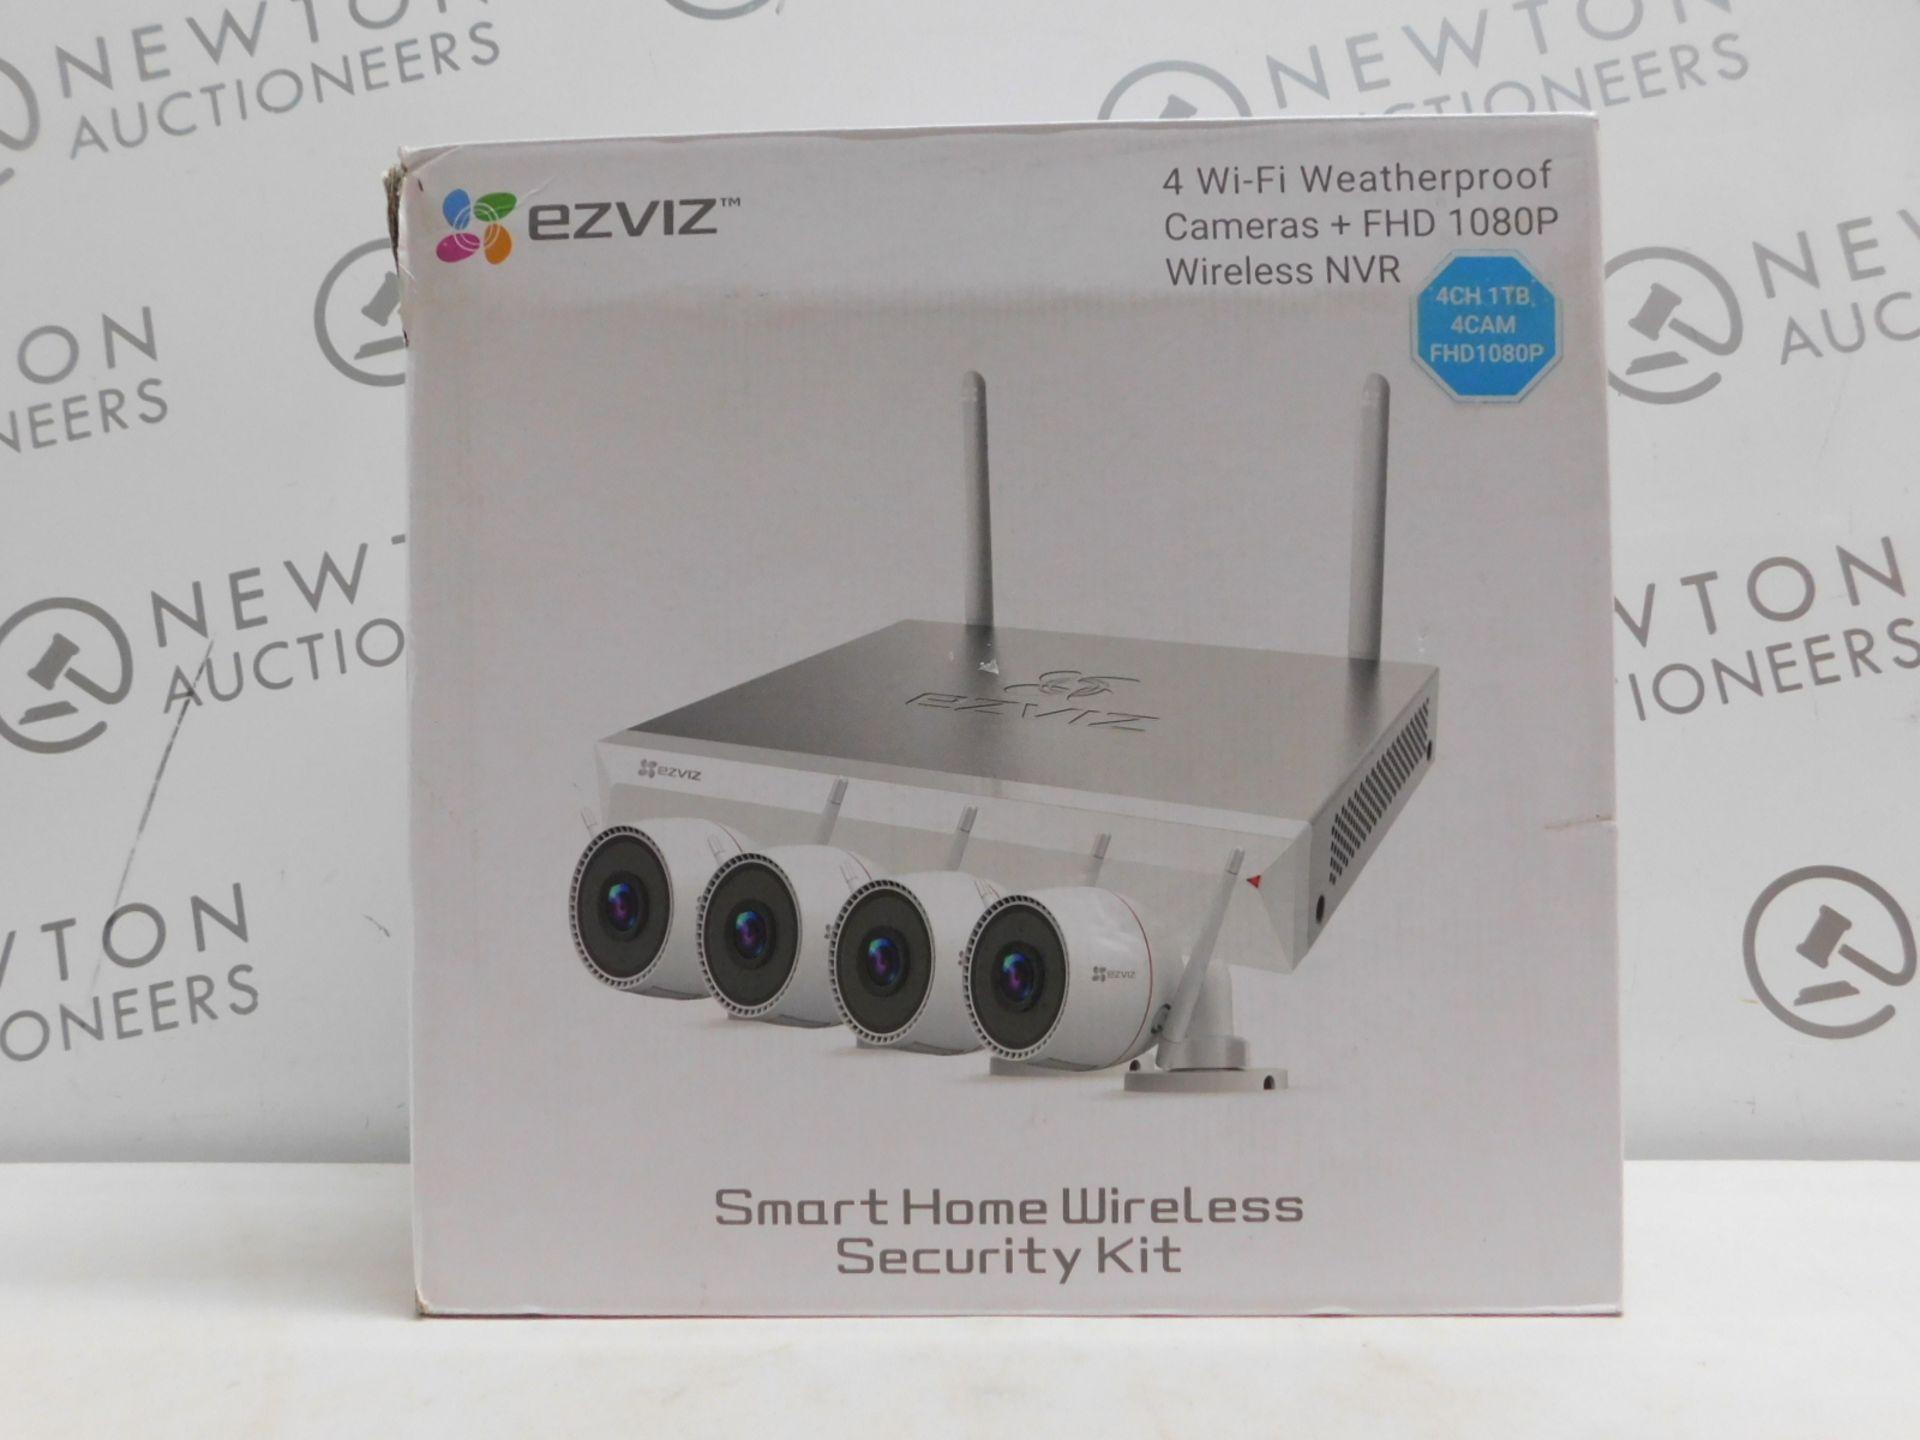 1 BOXED EZVIZ FULL HD 1080P AIR KIT, 4 X 1080P WIFI BULLET CAMERAS WITH 1TB NVR, MODEL CS-BW2424-